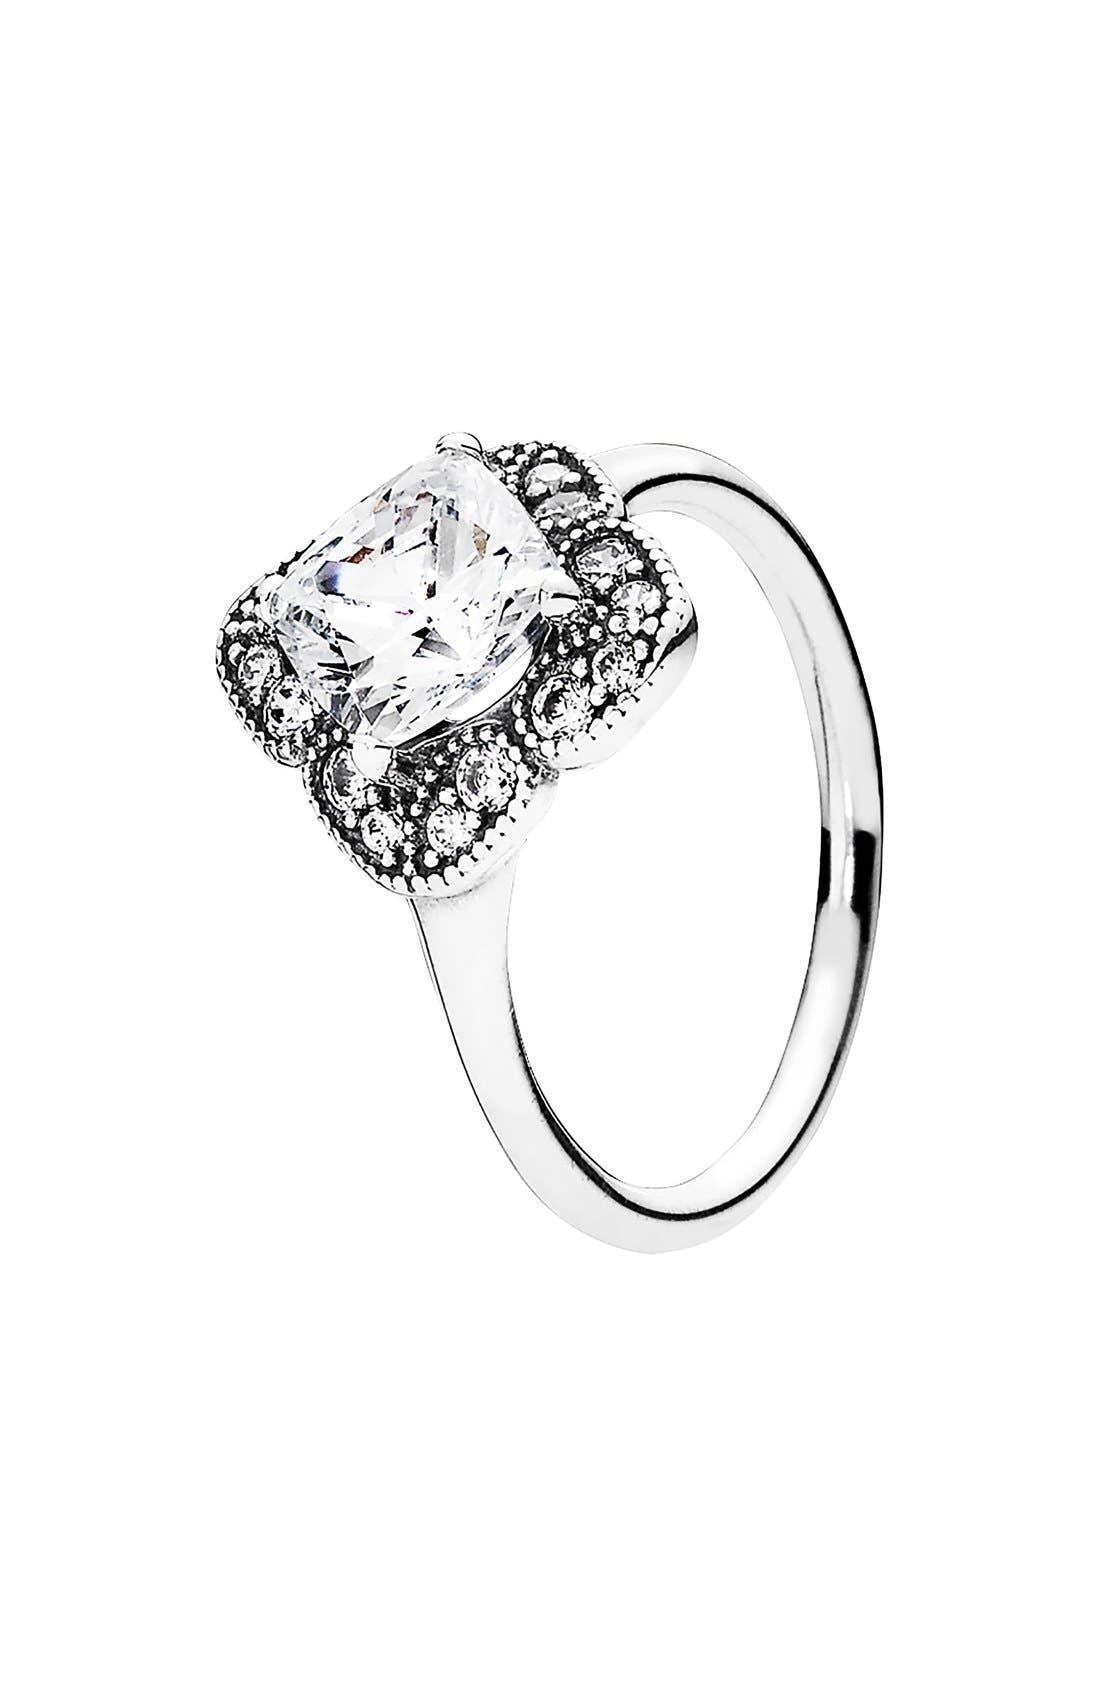 Alternate Image 1 Selected - PANDORA 'Floral Fancy' Ring